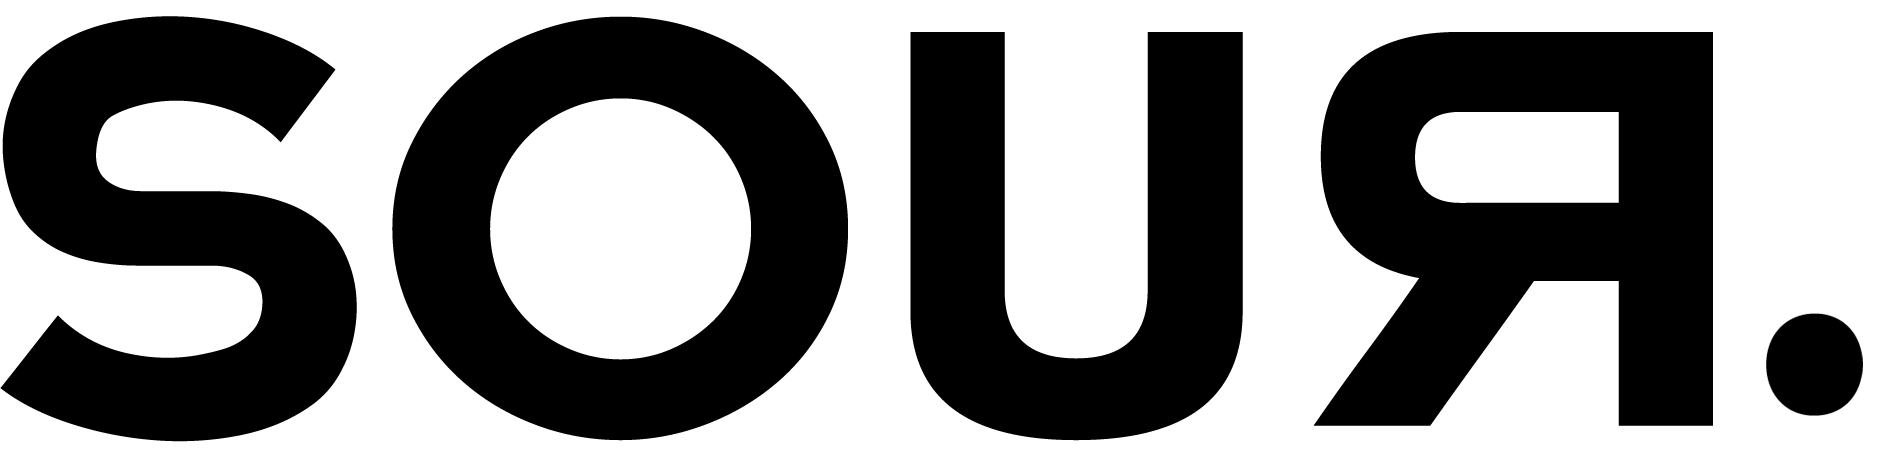 Logo da Sour Brazil